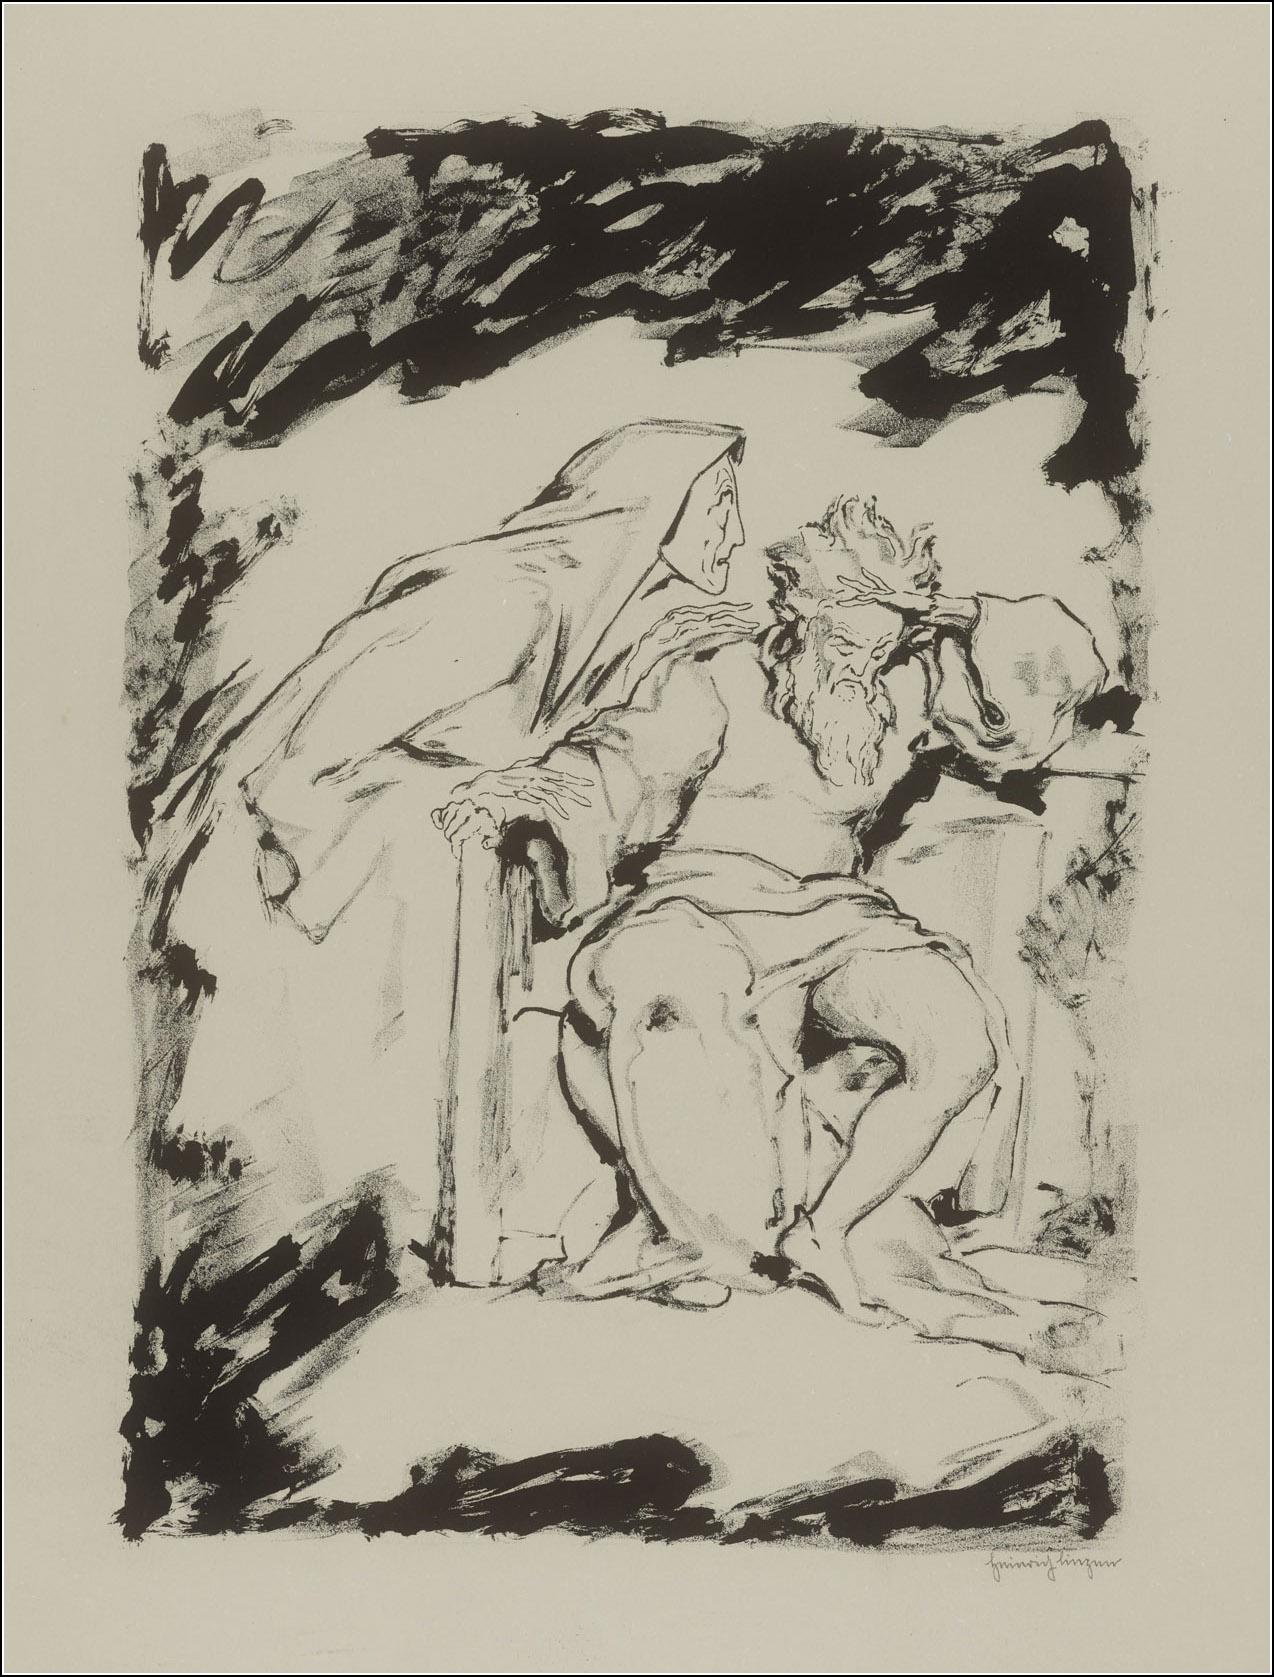 Heinrich Linzen, Faust